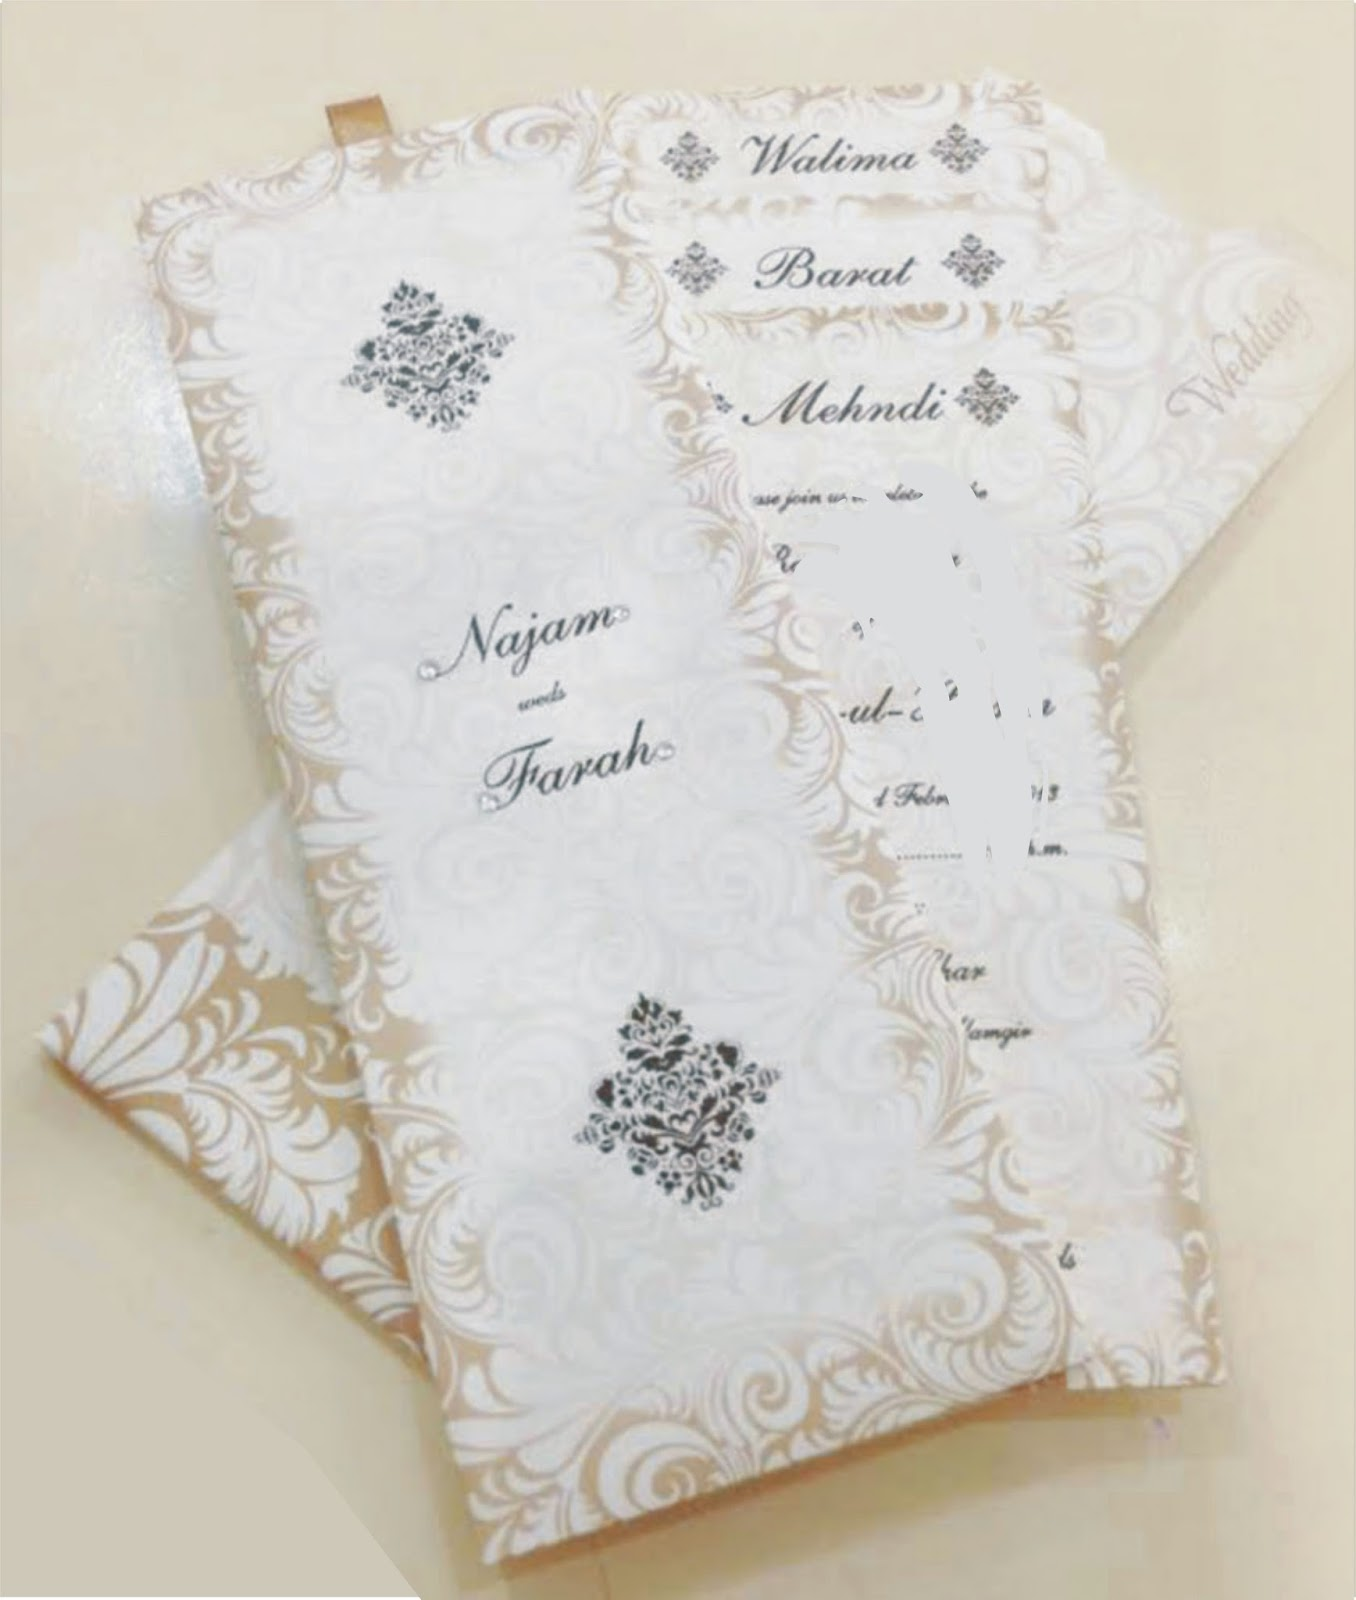 Zem Printers: Wedding Cards In Pakistan